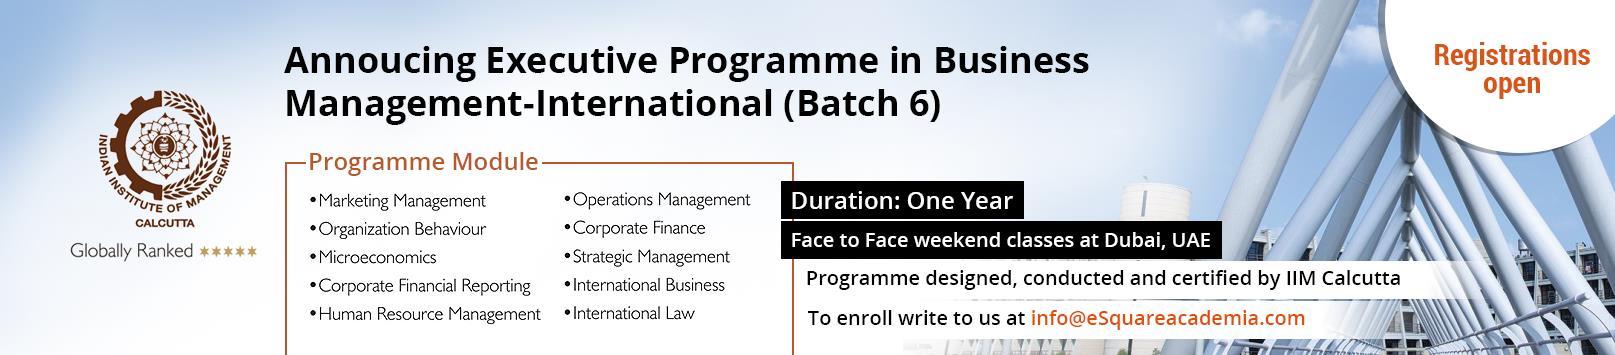 Advanced Programme in Data Sciences (APDS) | IIM Calcutta